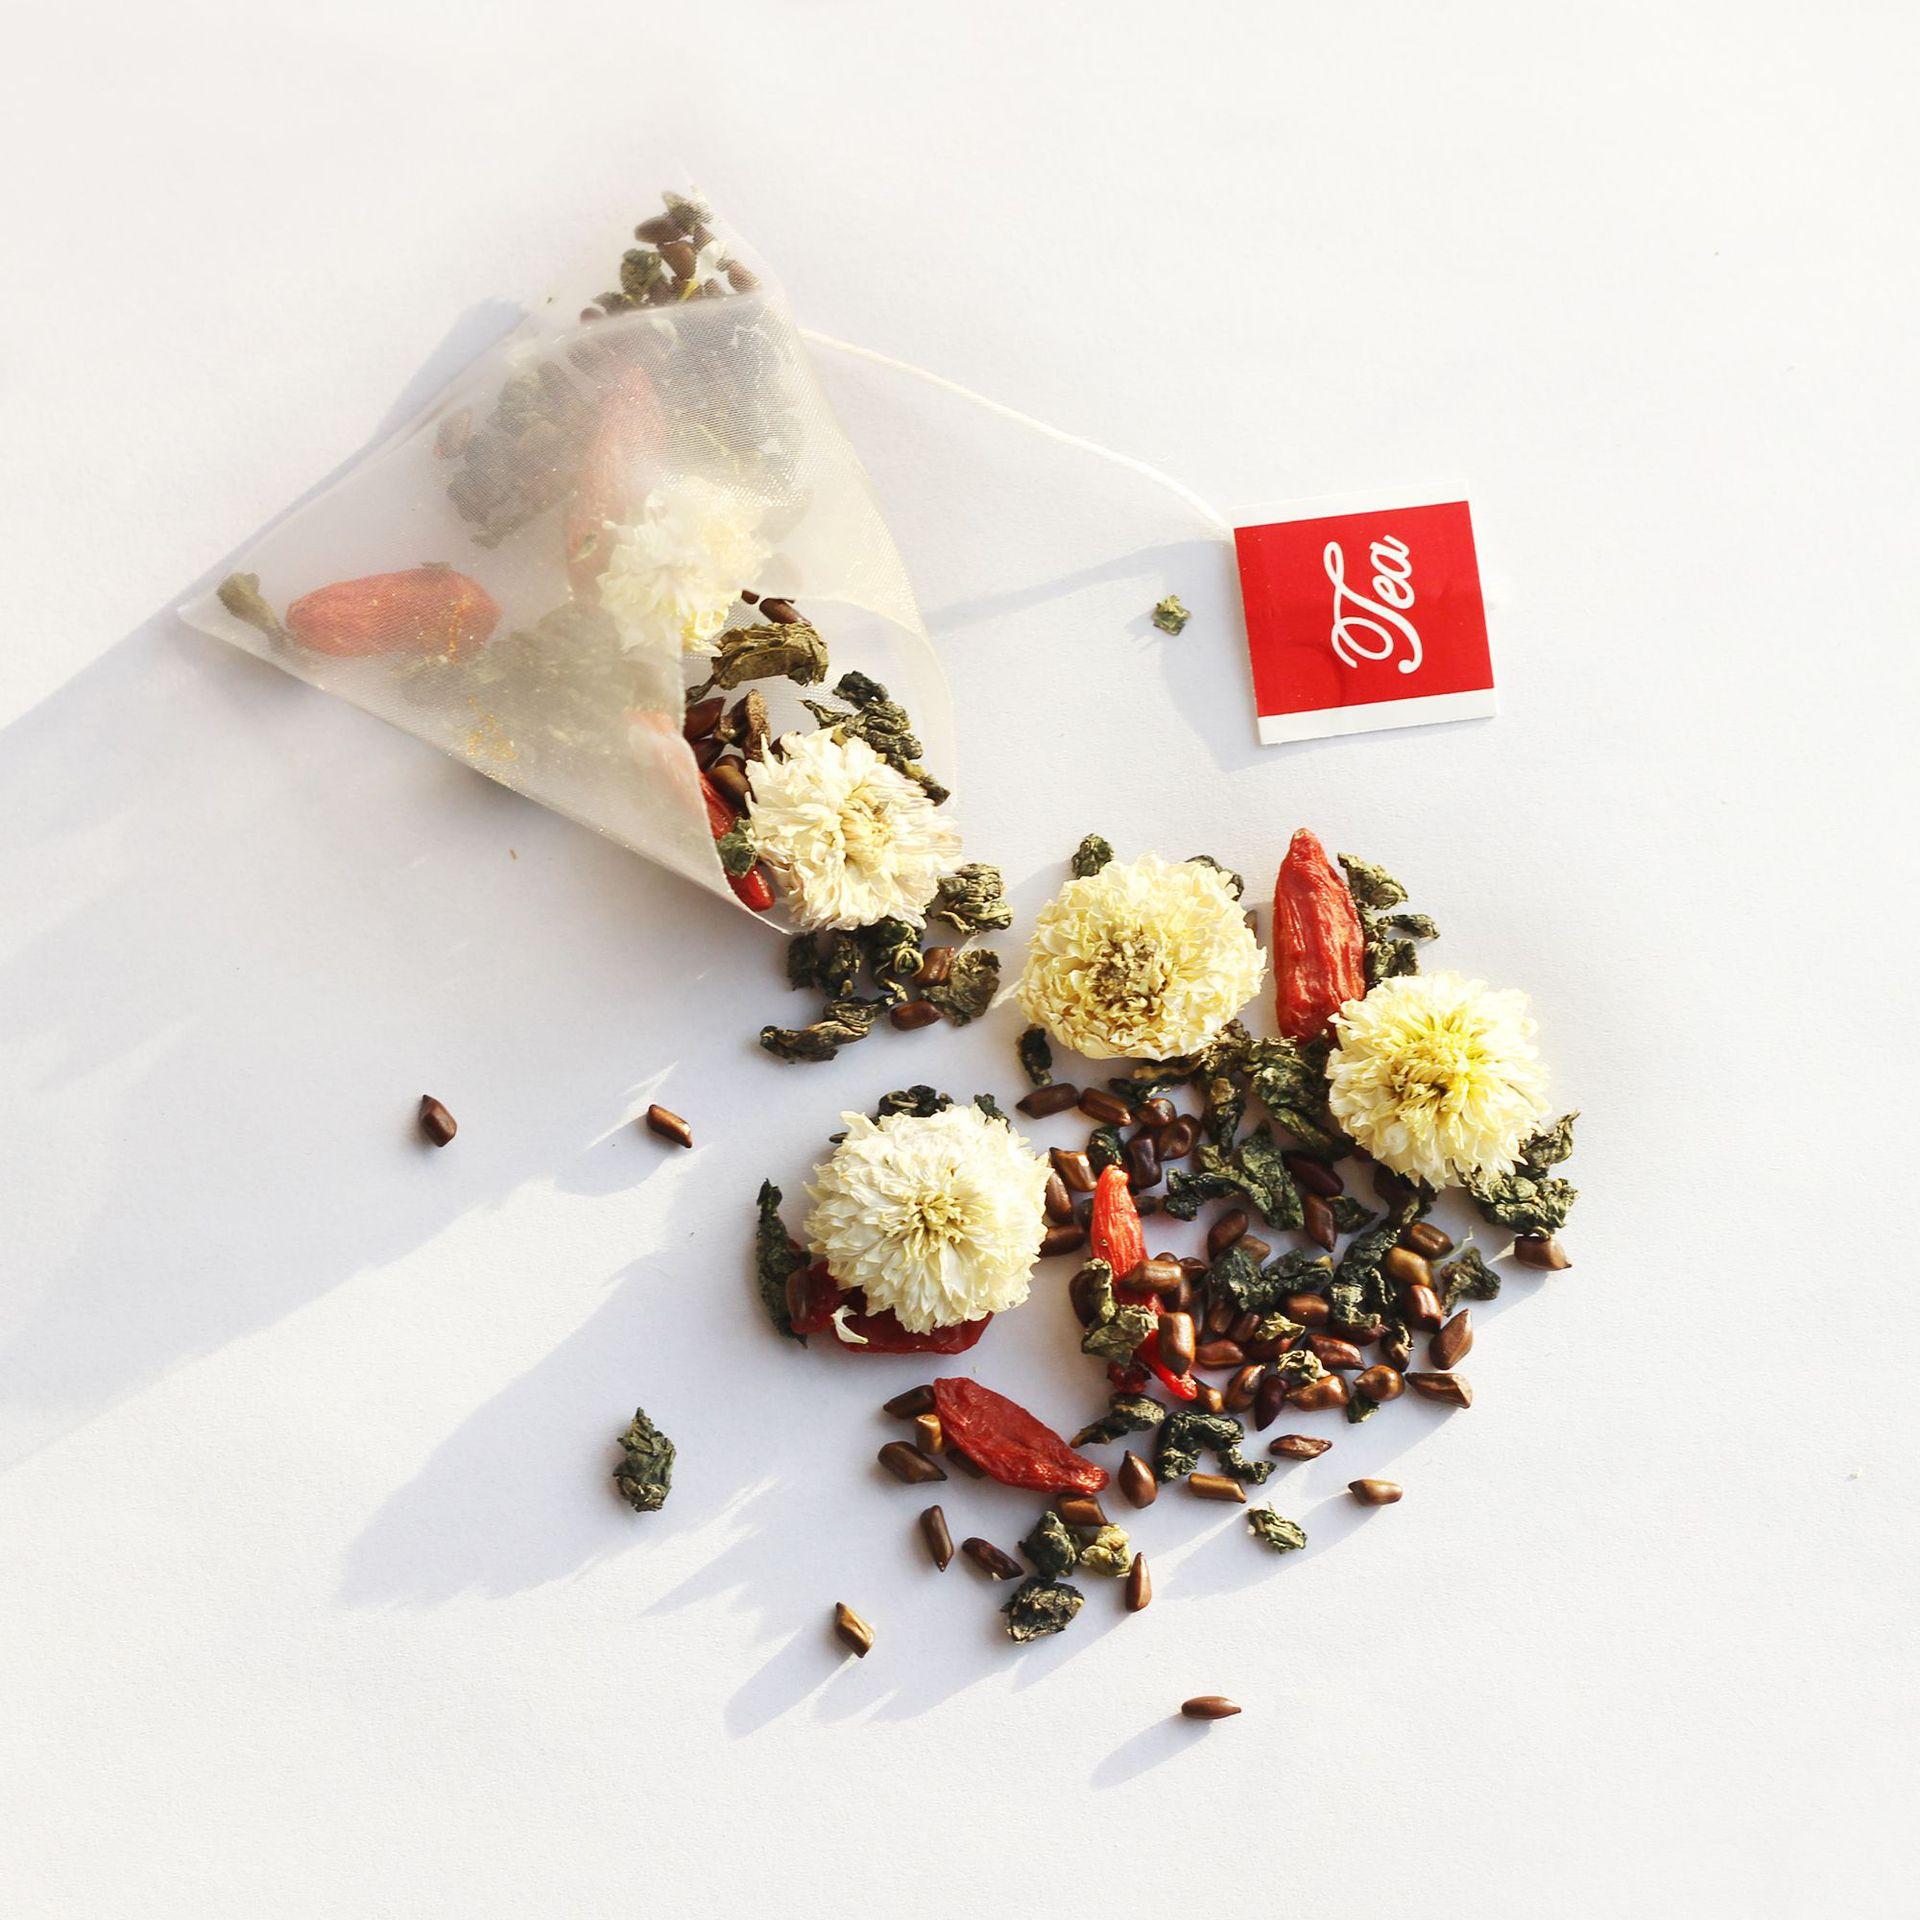 Private Label Wholesale Semen Cassiae Dried Chrysanthemum Tea Bags For Lowering Blood Pressure Woman's Tea - 4uTea   4uTea.com